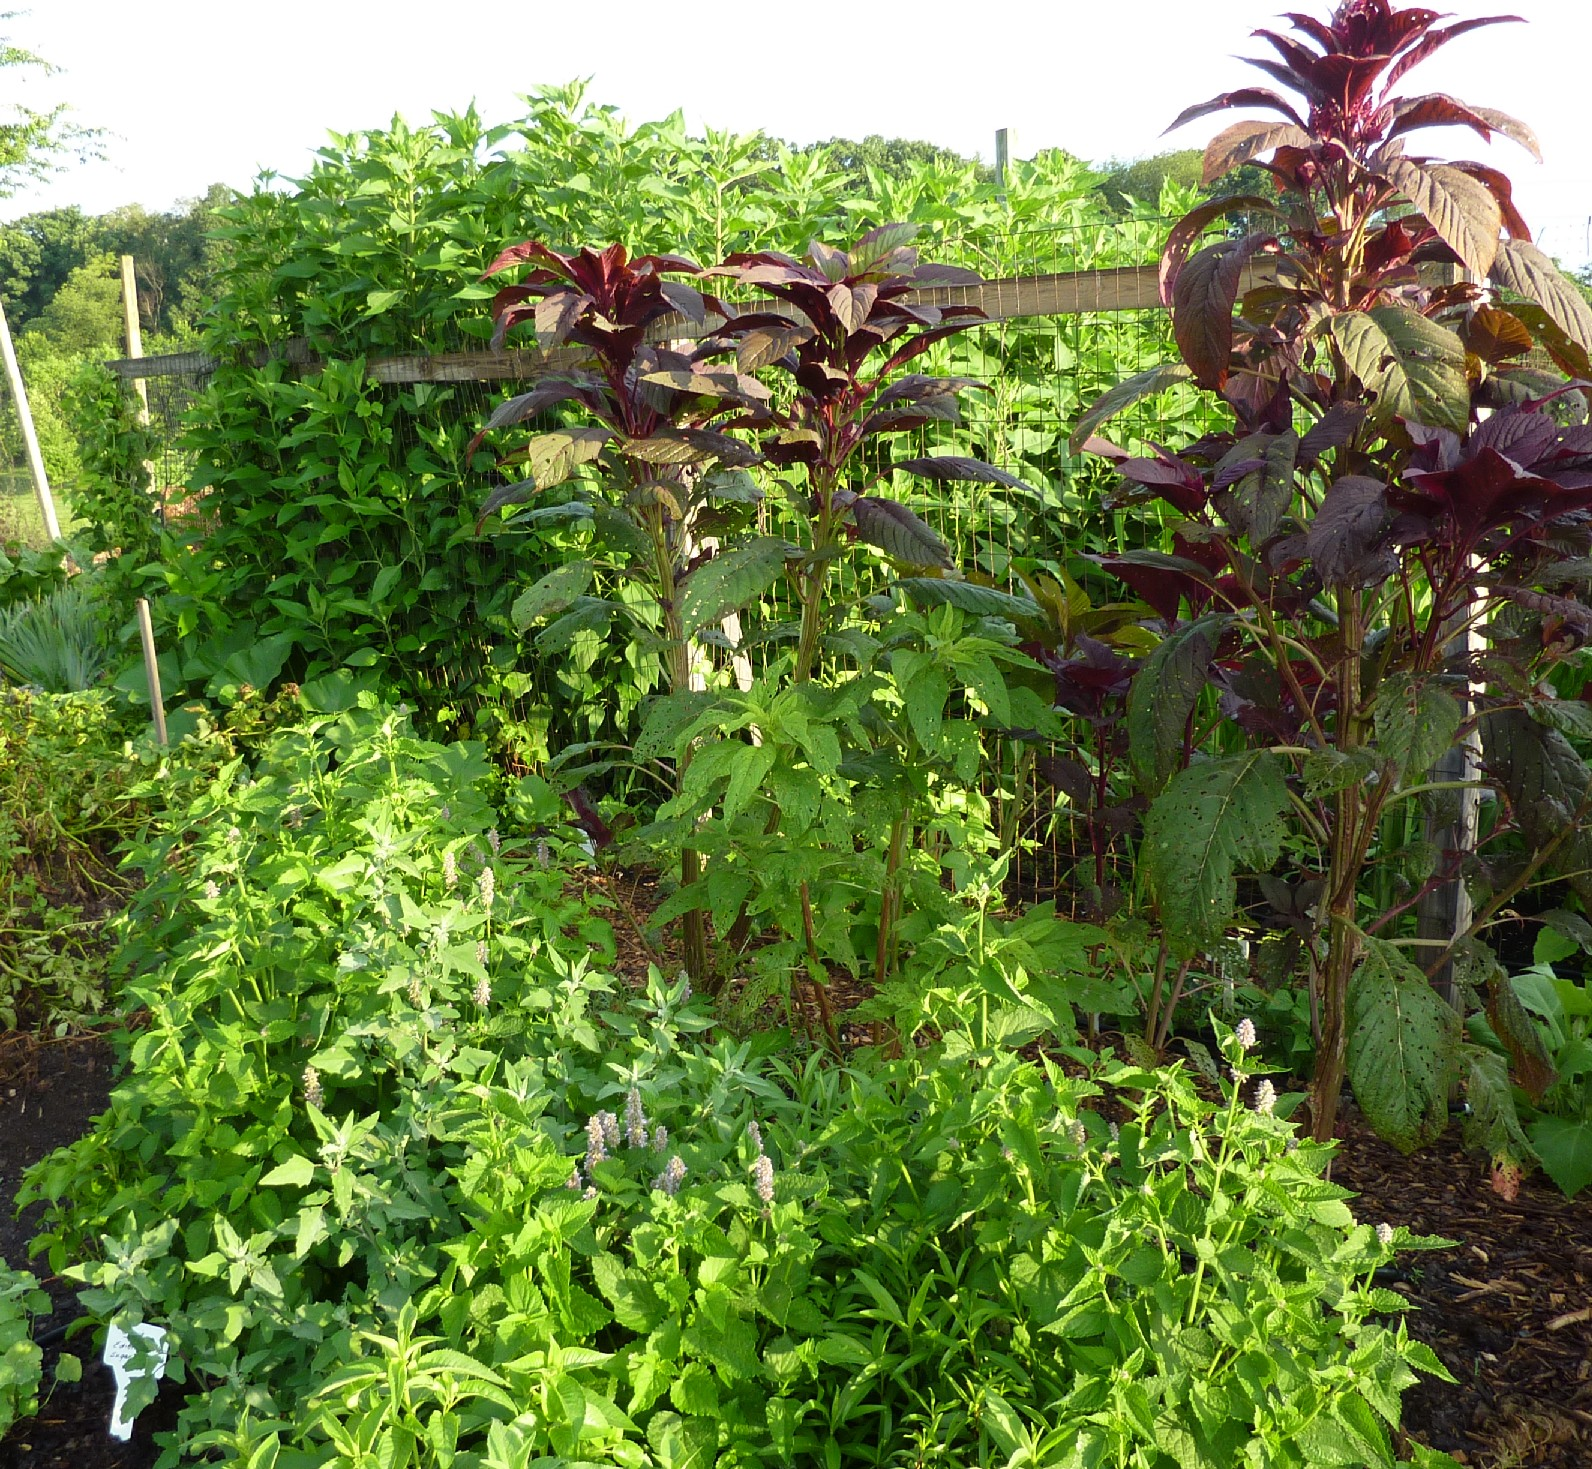 American herbs